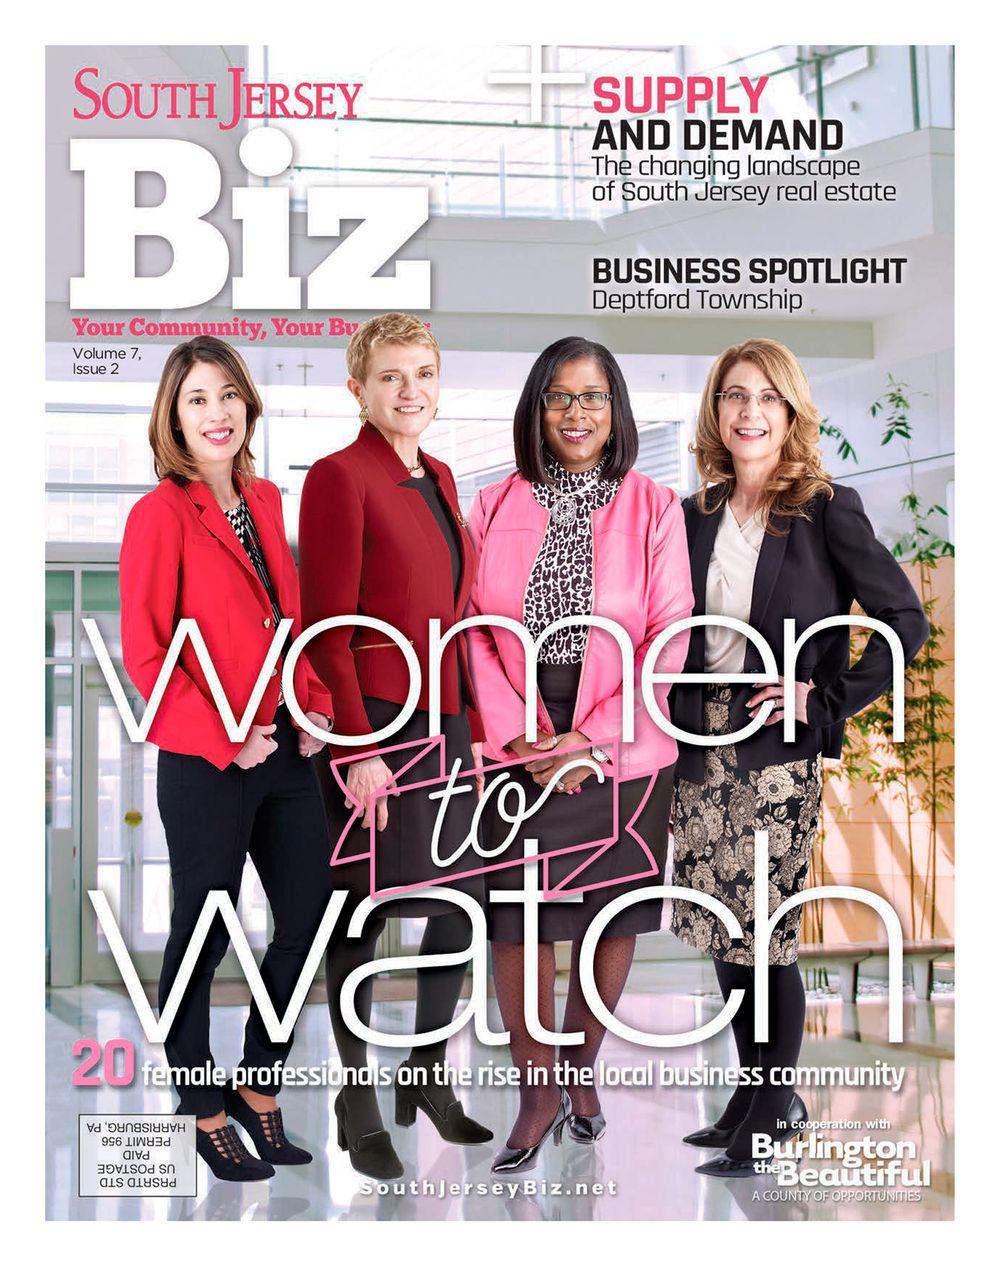 SJ-Biz-Women-to-Watch.jpg